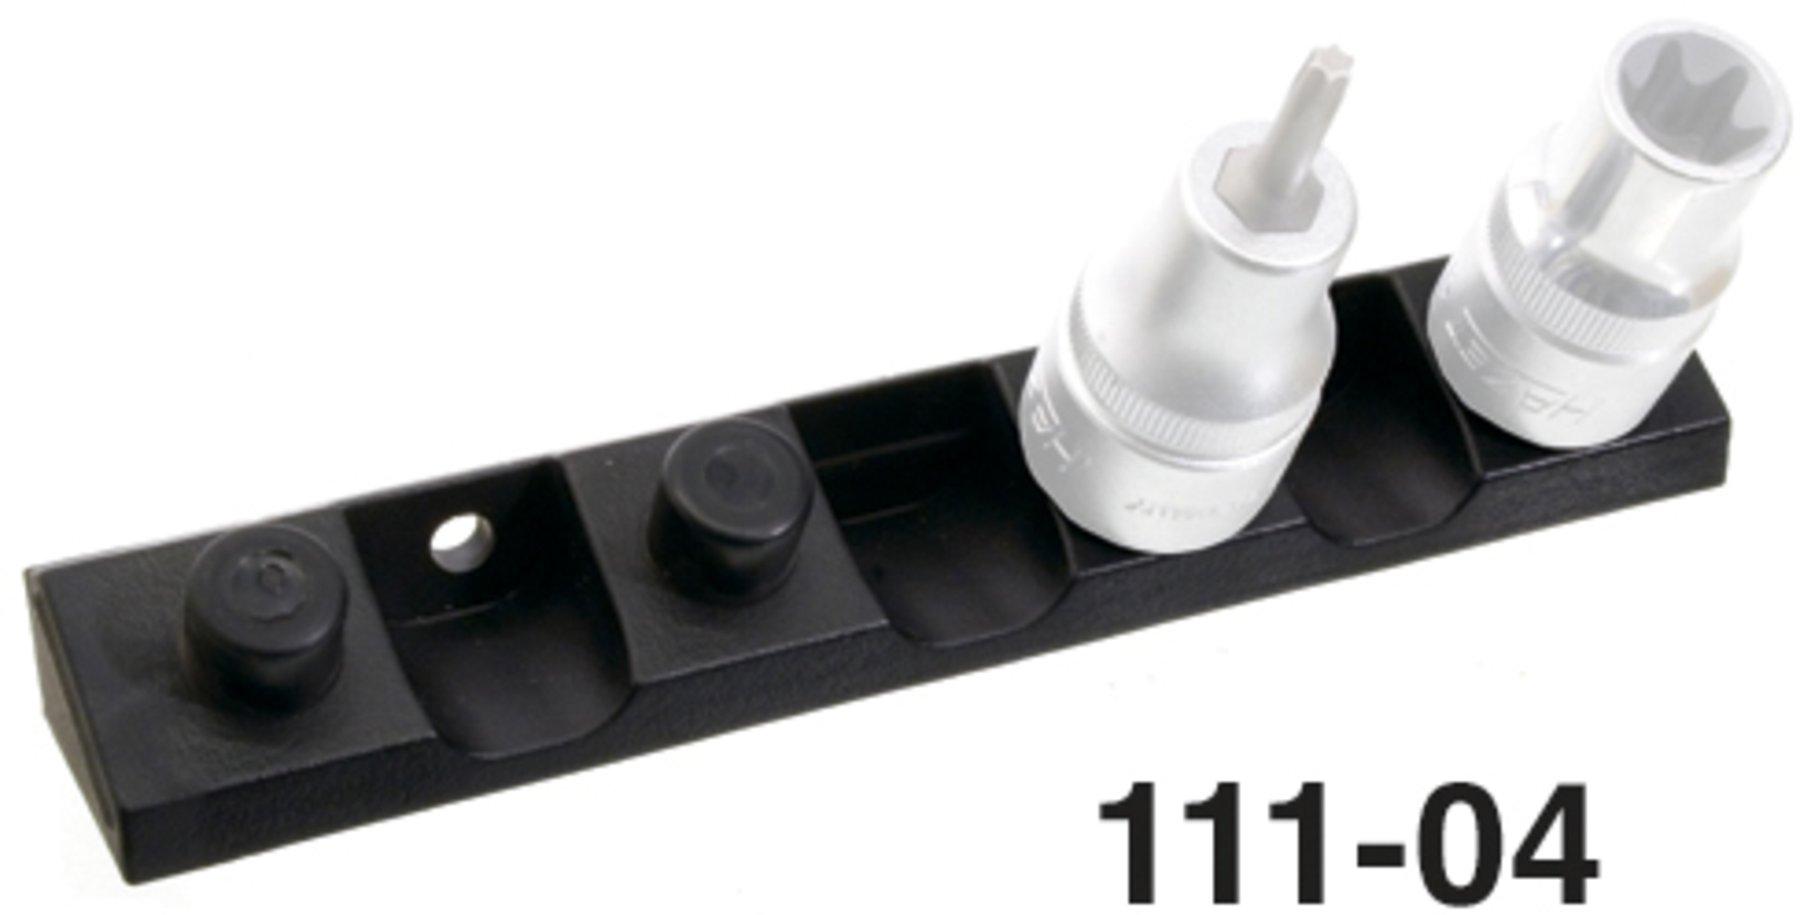 75mm KS TOOLS Werkzeughalter mit senkrechtem Hakenende Ø 6mm